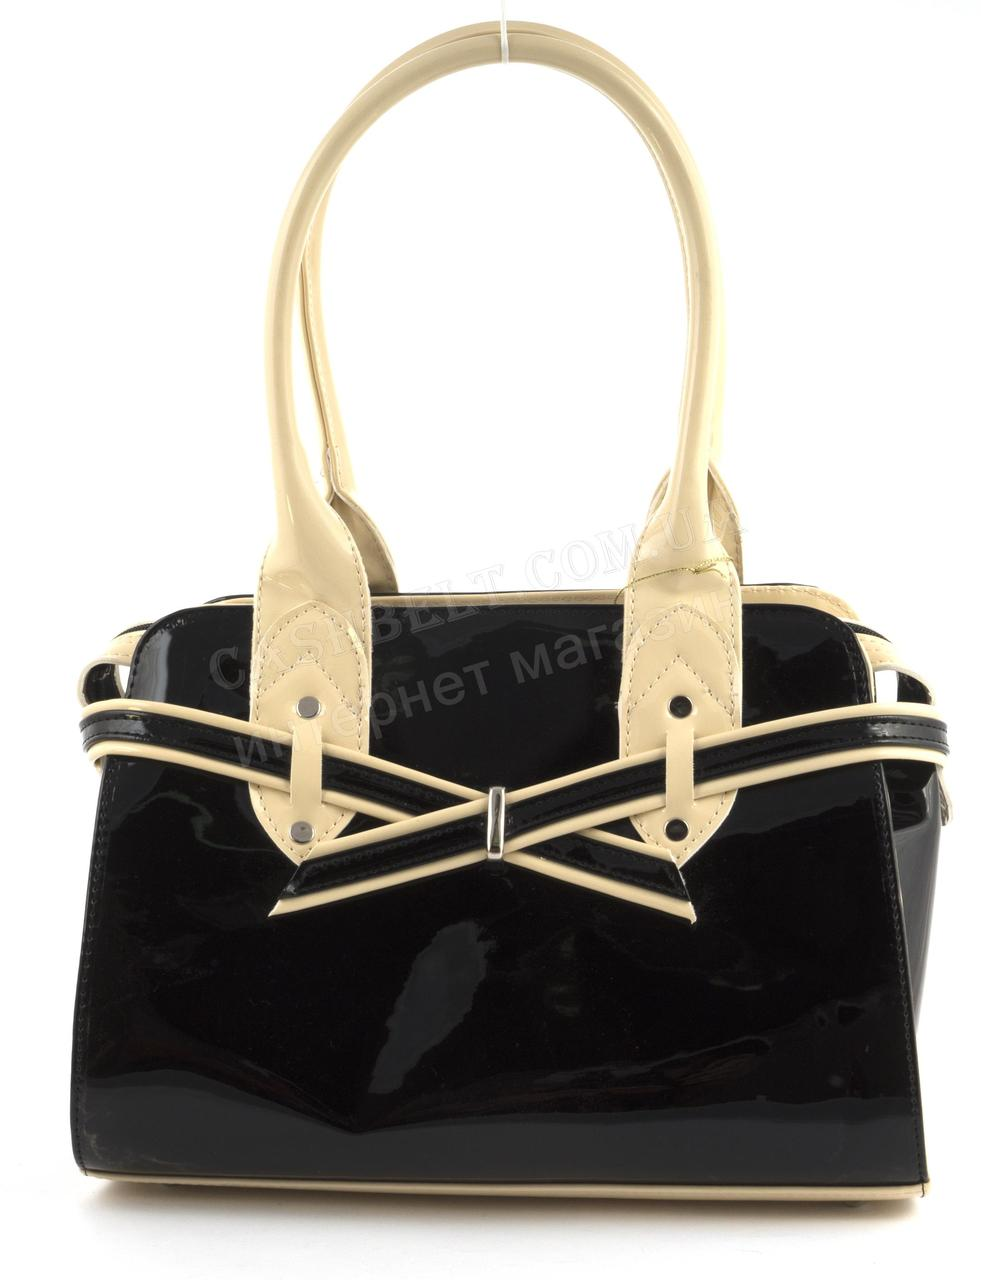 2d3d54c971ce Каркасная стильная качественная лаковая двухцветная сумка ZGARDA art. 18-14  черная/бежевая Украина